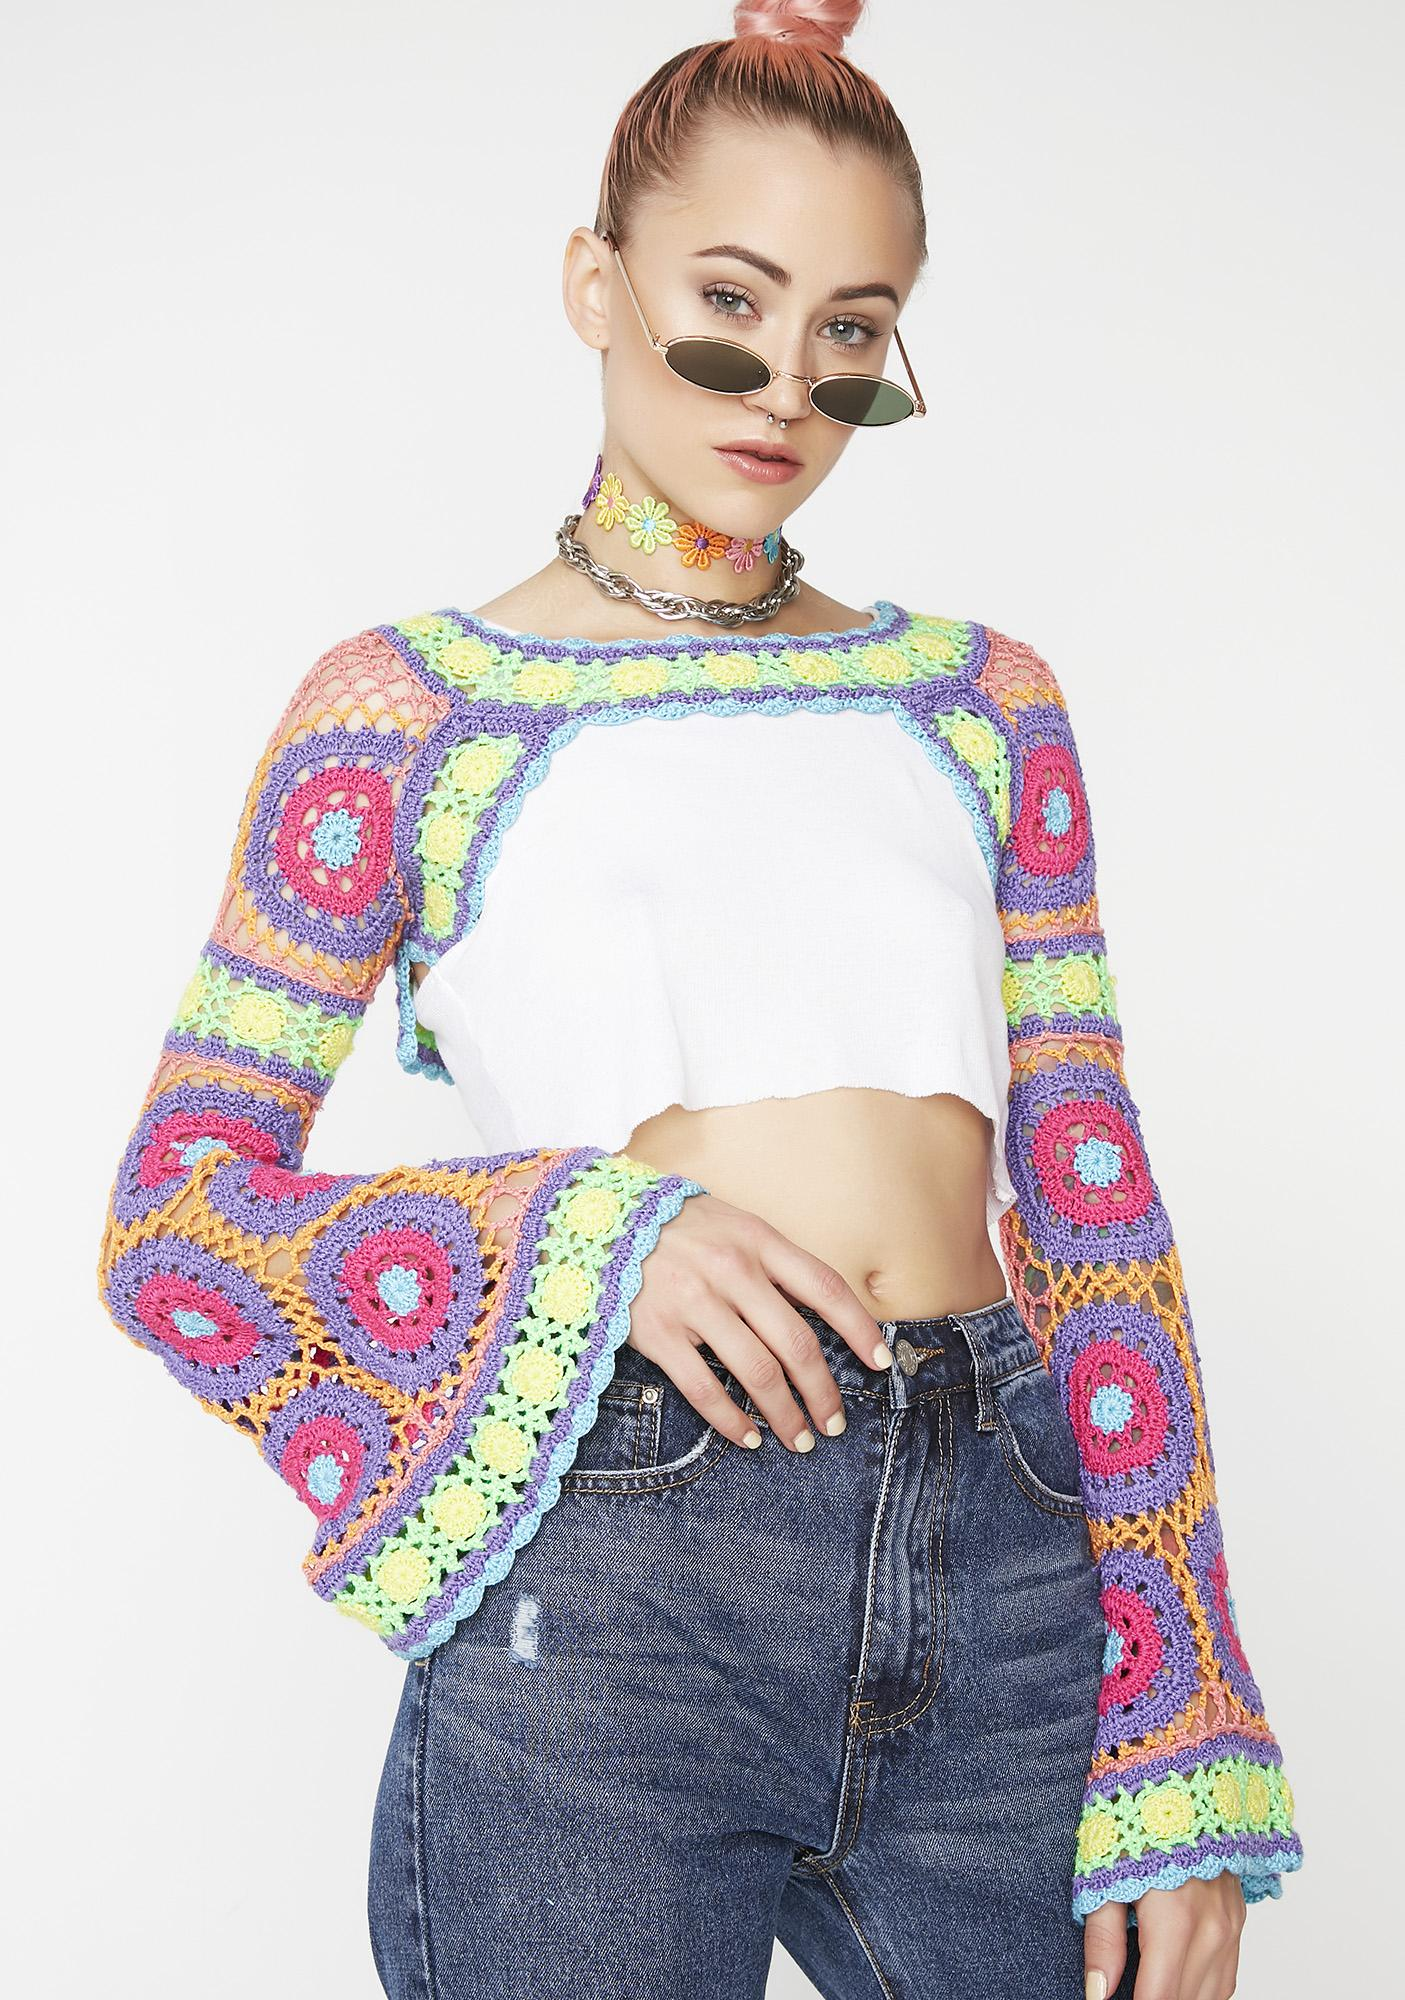 Current Mood Free Your Mind Crochet Shrug